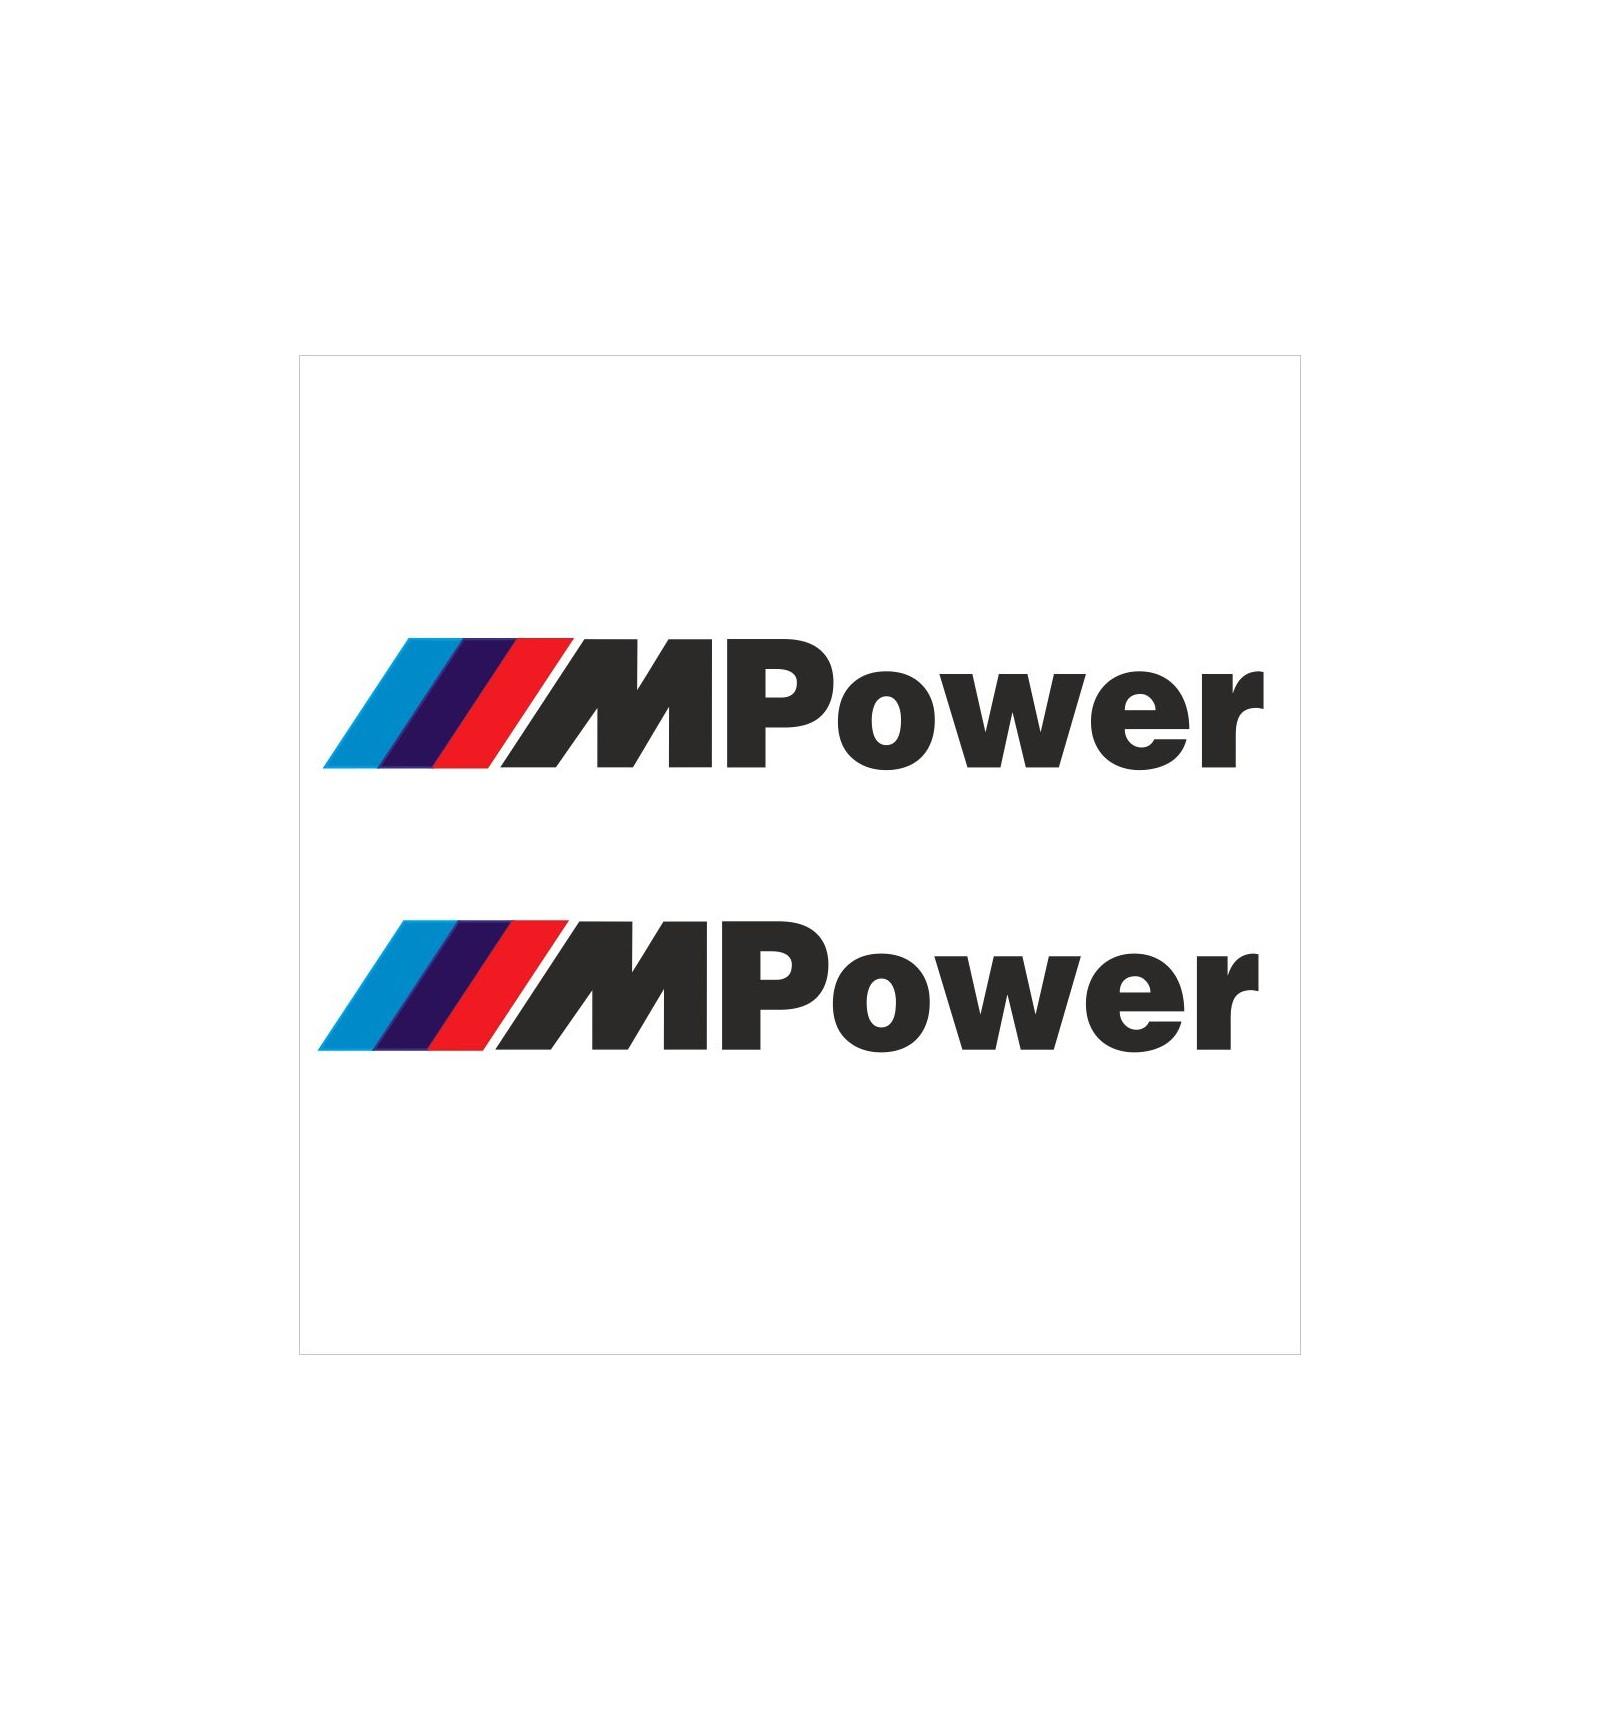 M power Logos